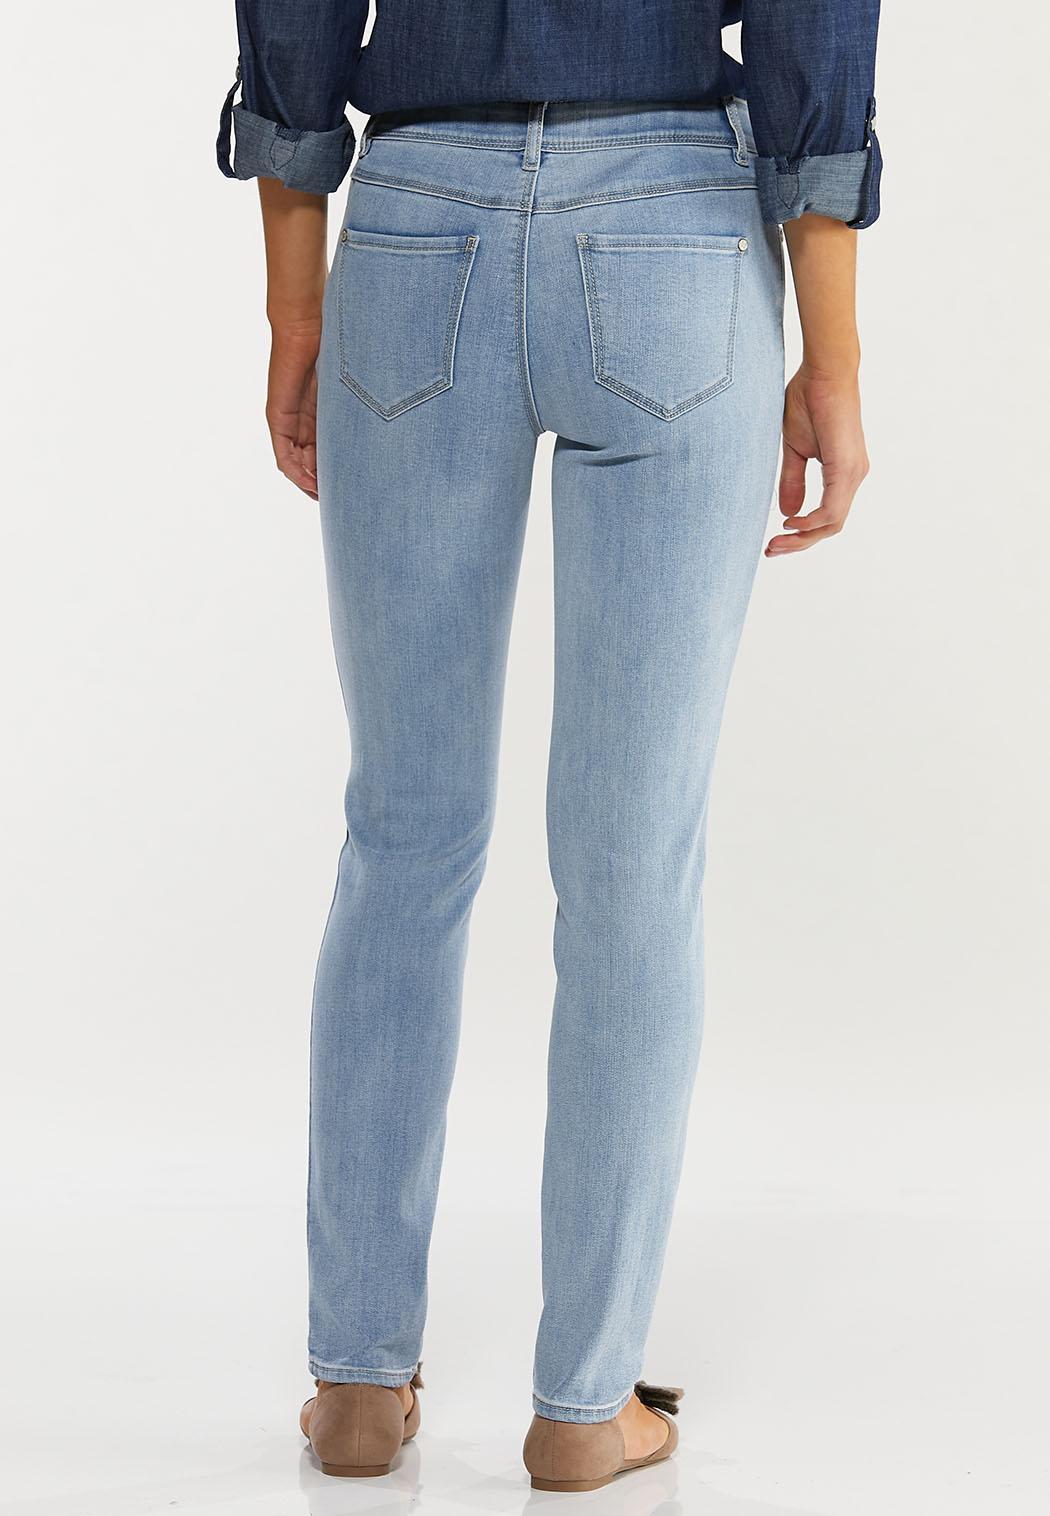 Lightwash Skinny Jeans (Item #44492332)